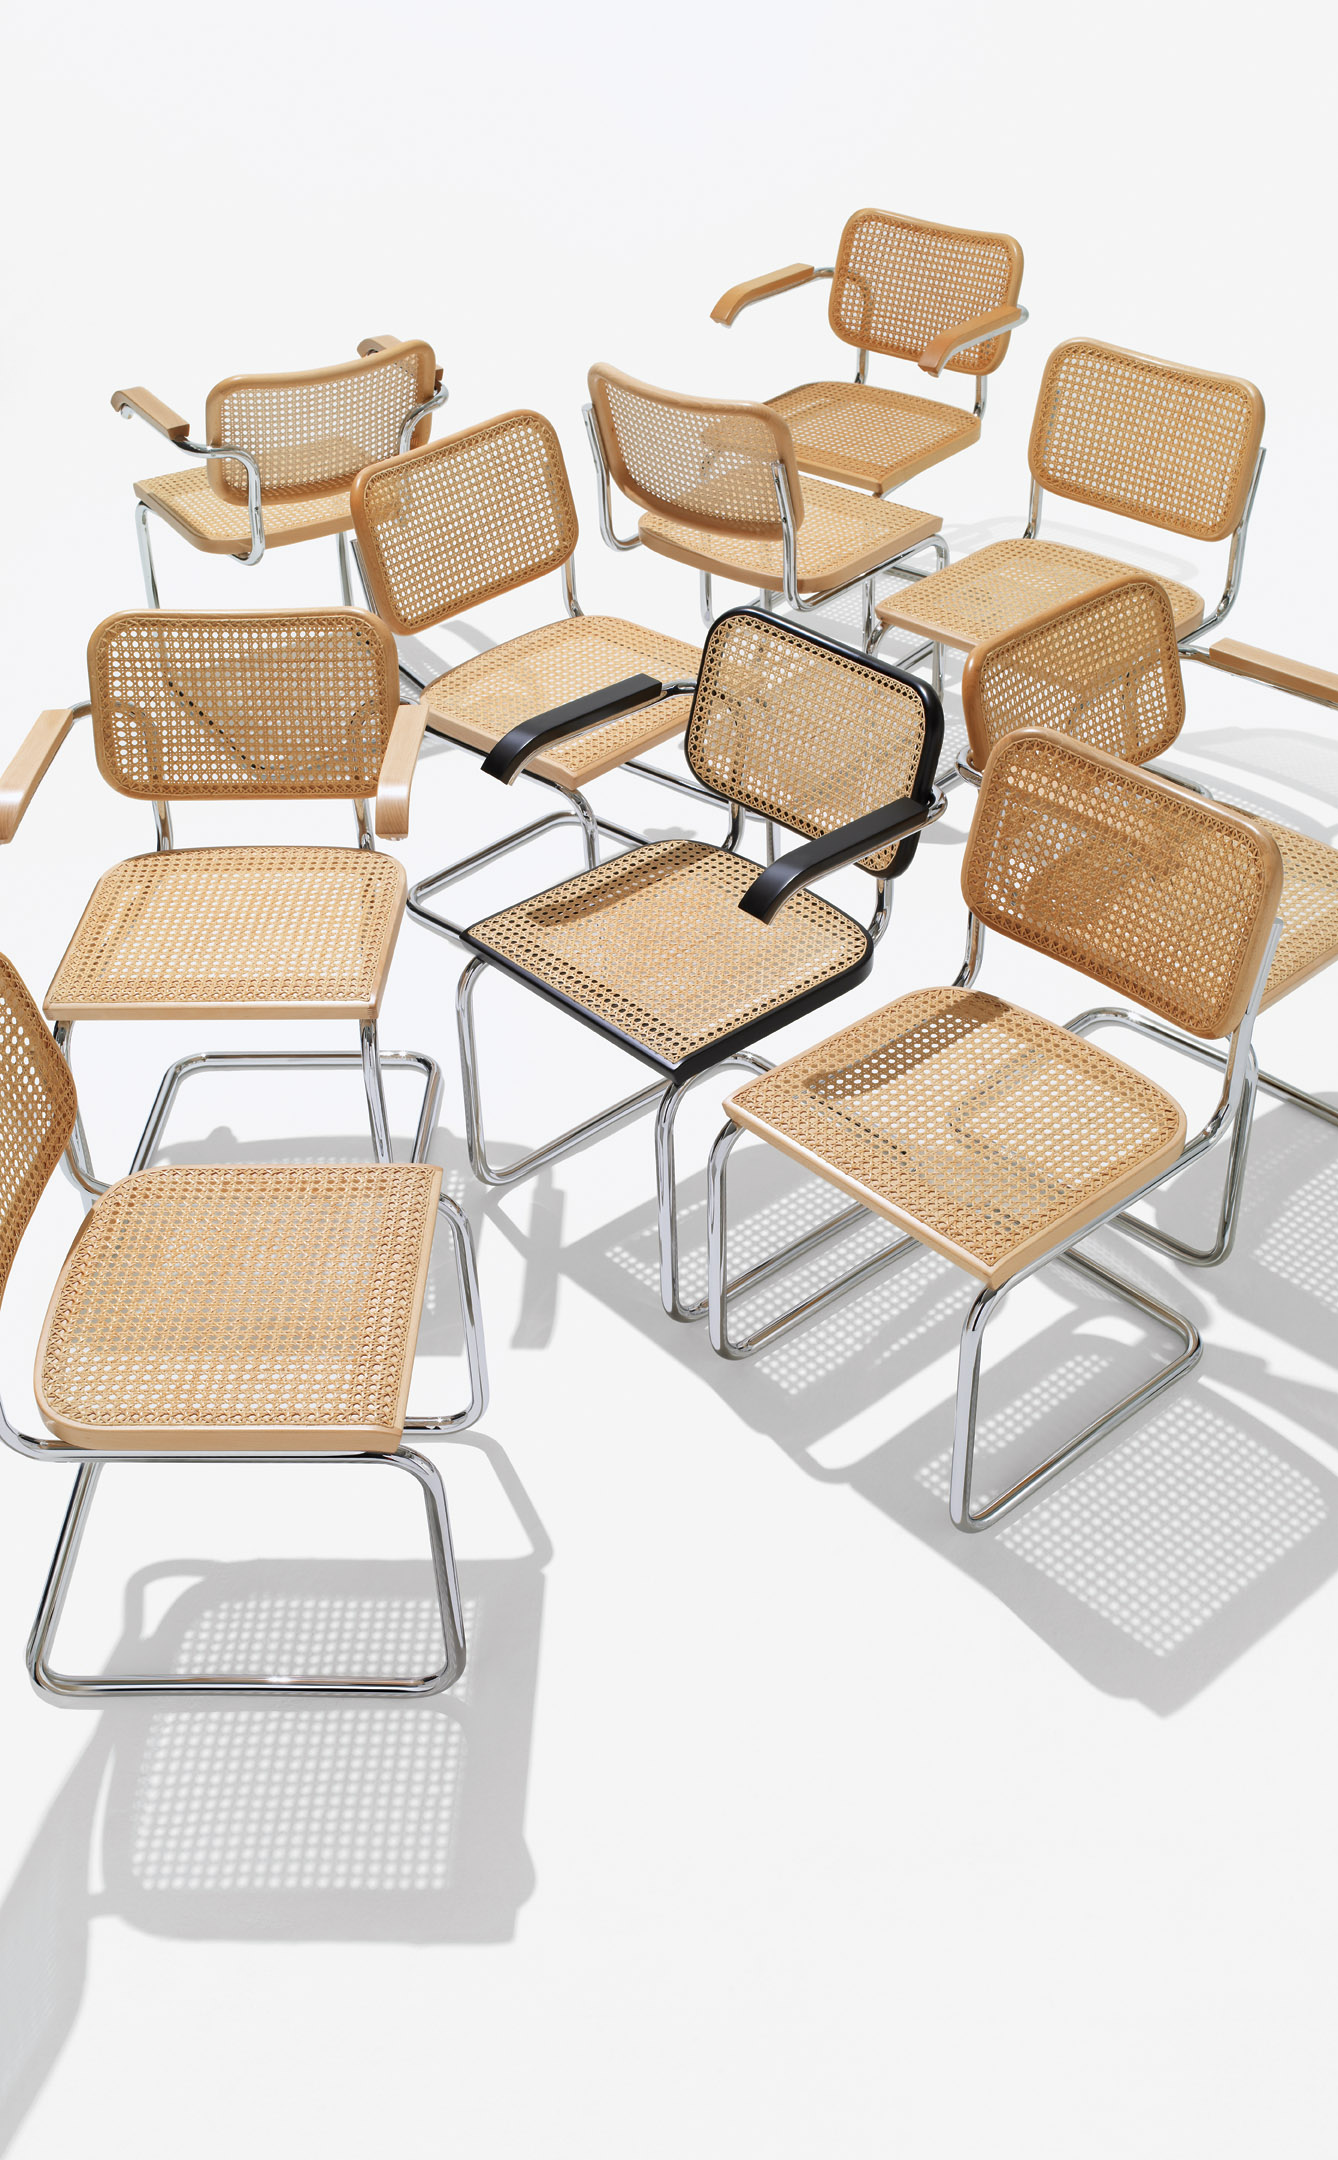 Breuer chair cane - Low